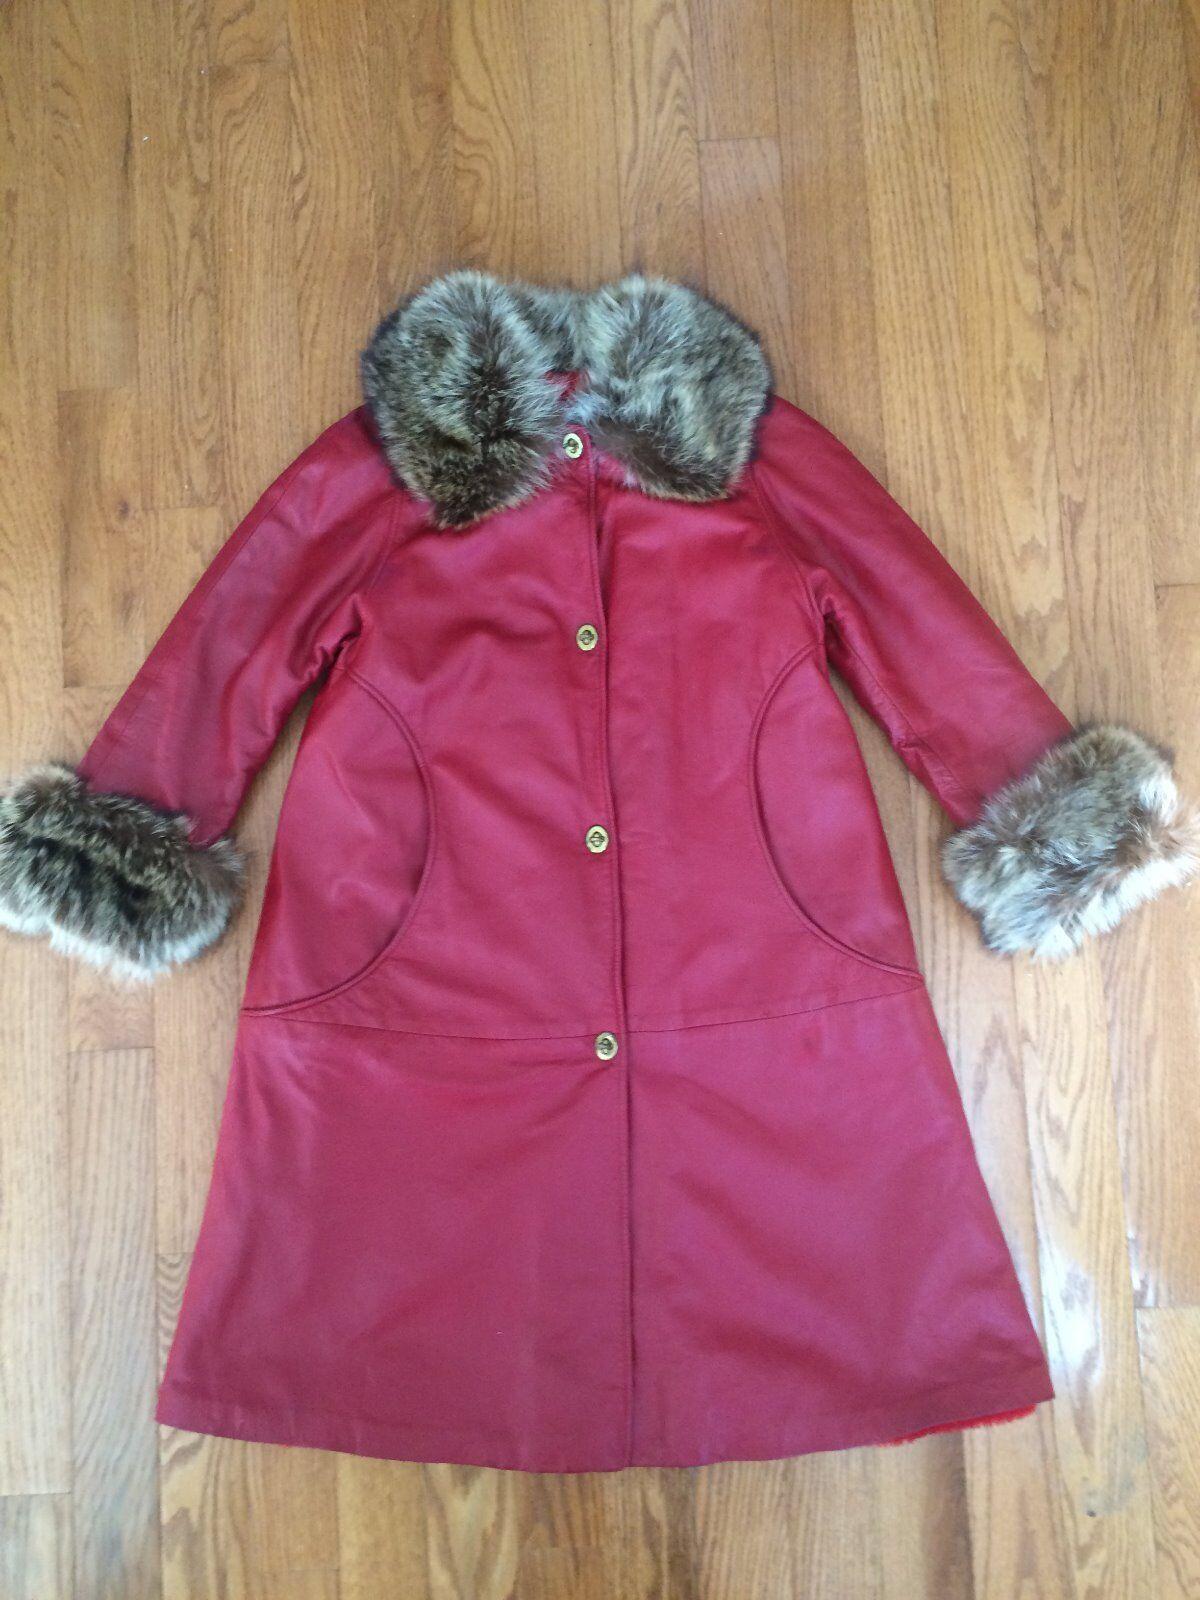 Vintage Bonnie Cashin for Sills red Angola leathe… - image 7